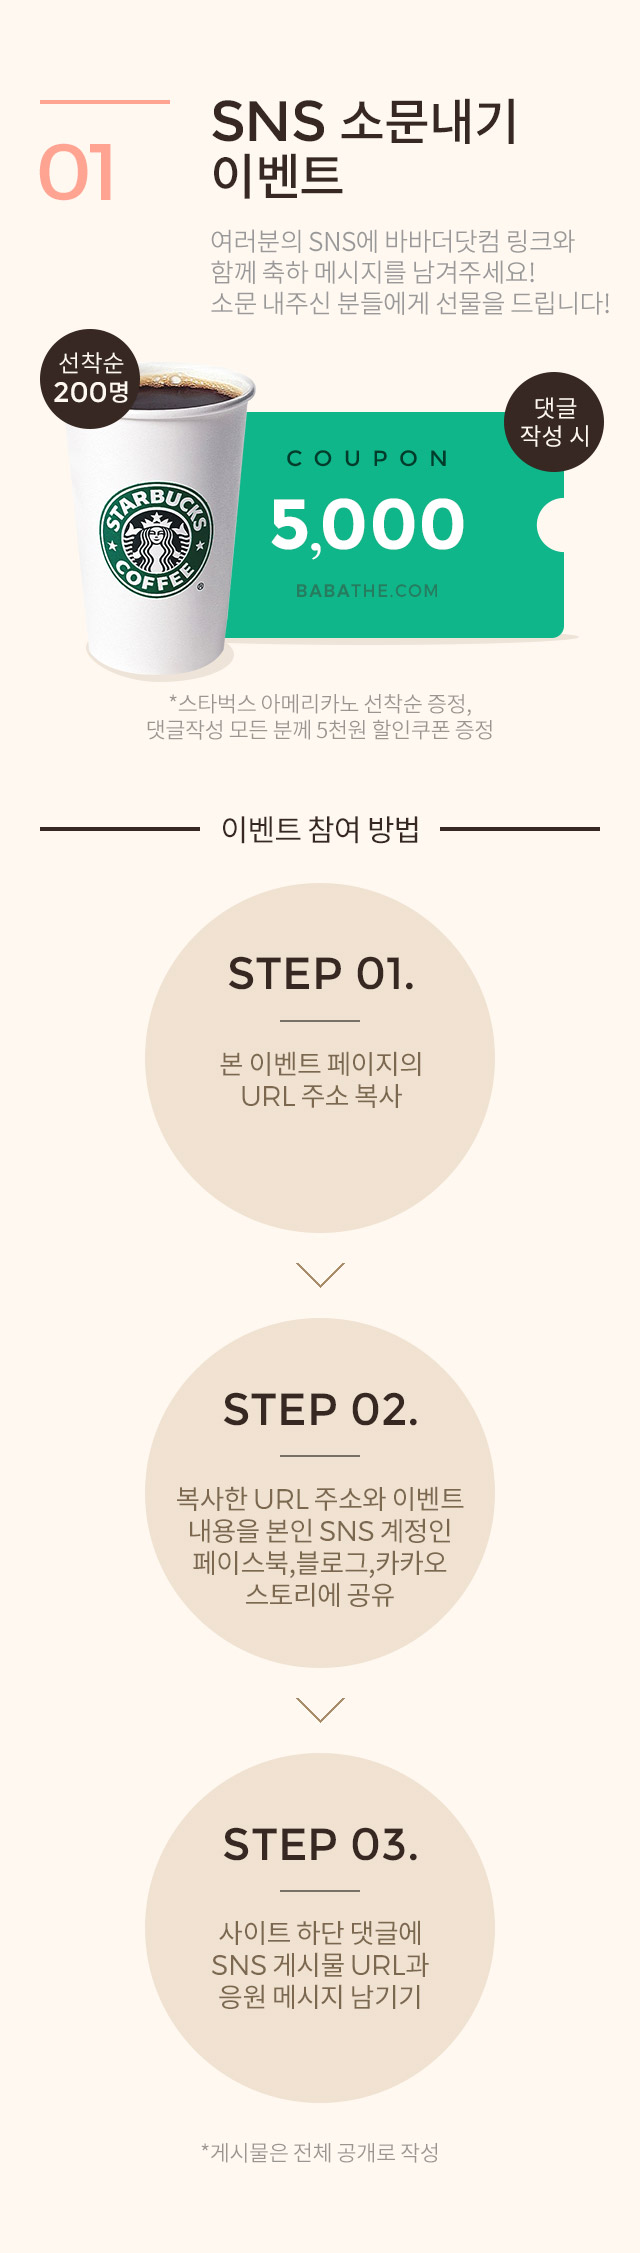 01. SNS 소문내기 이벤트